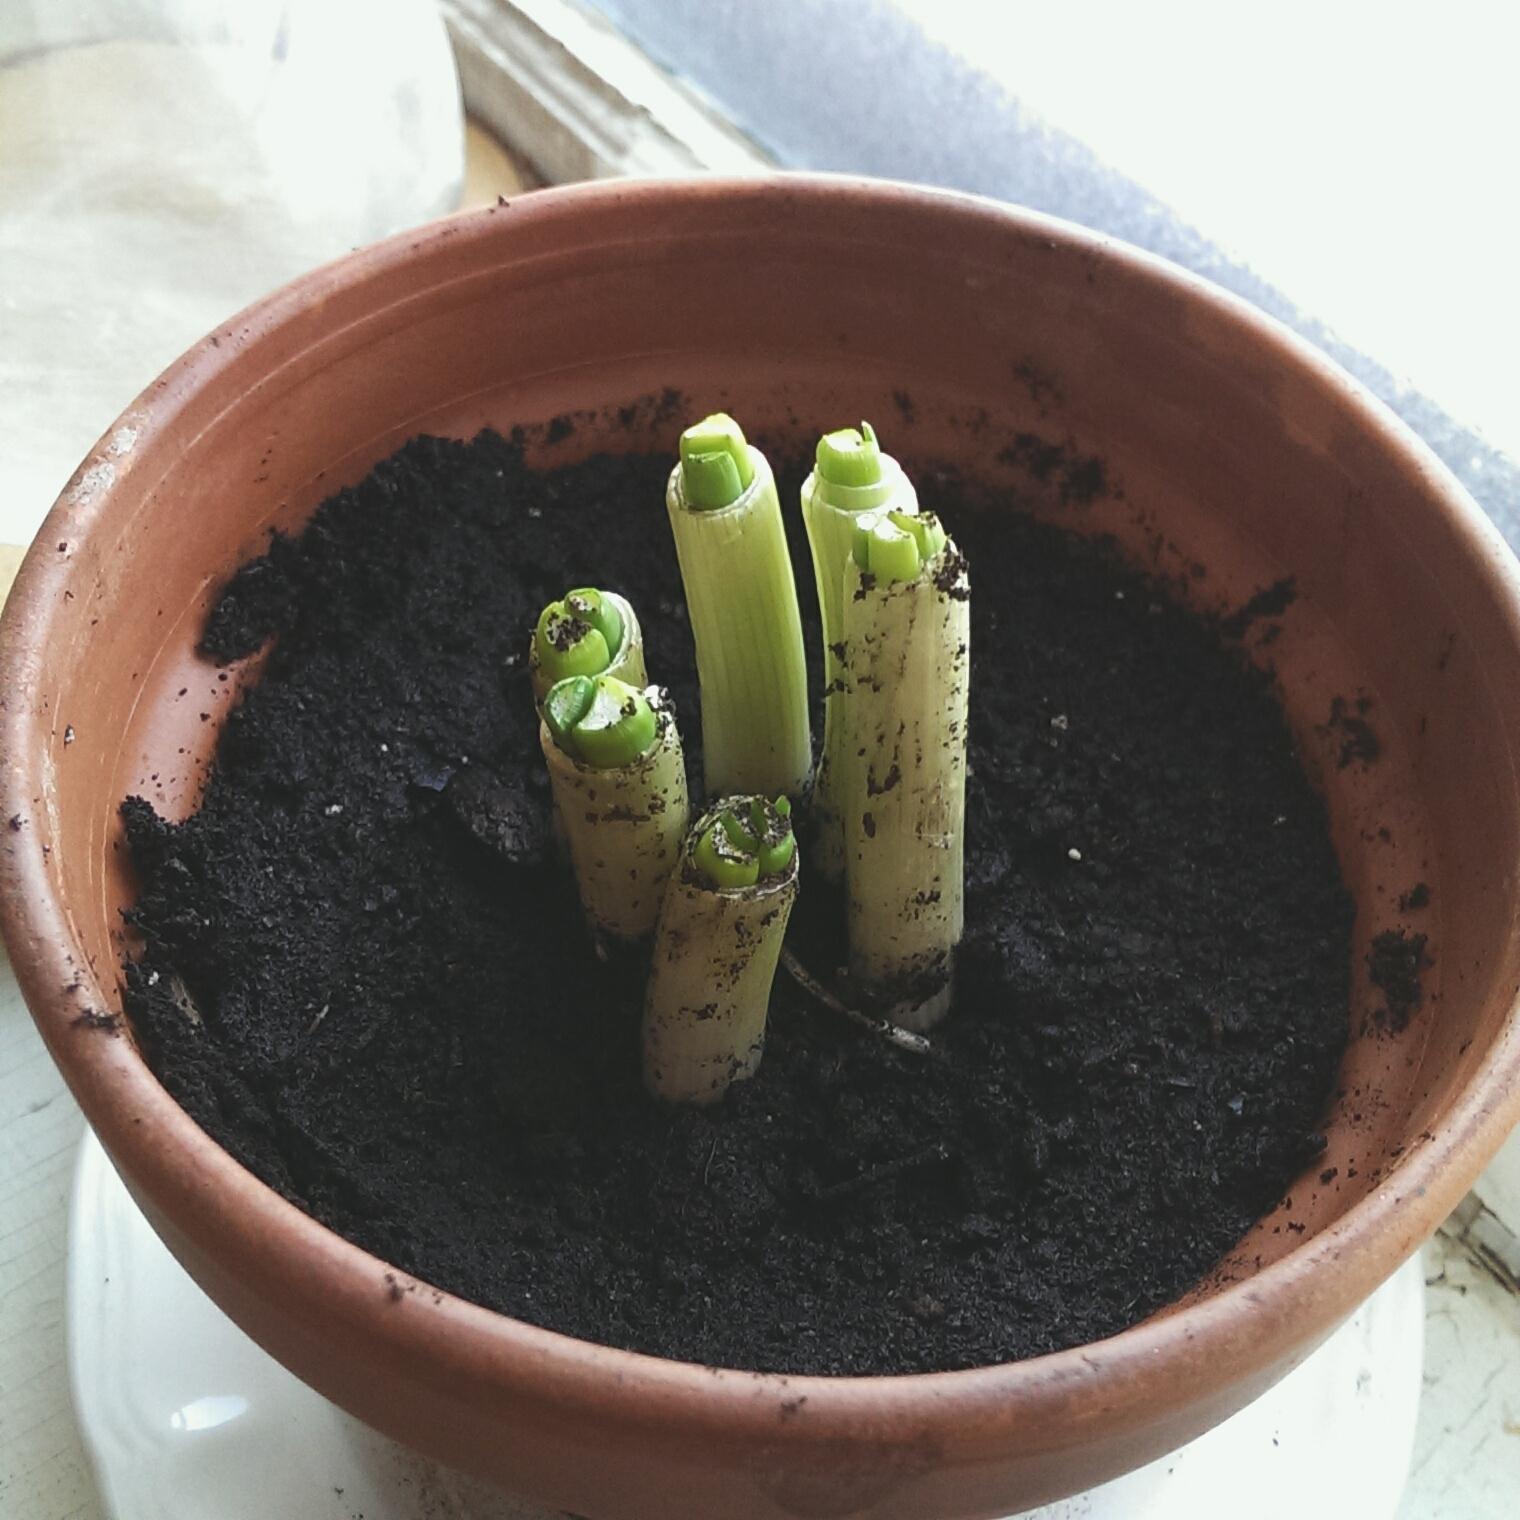 green onion growth!